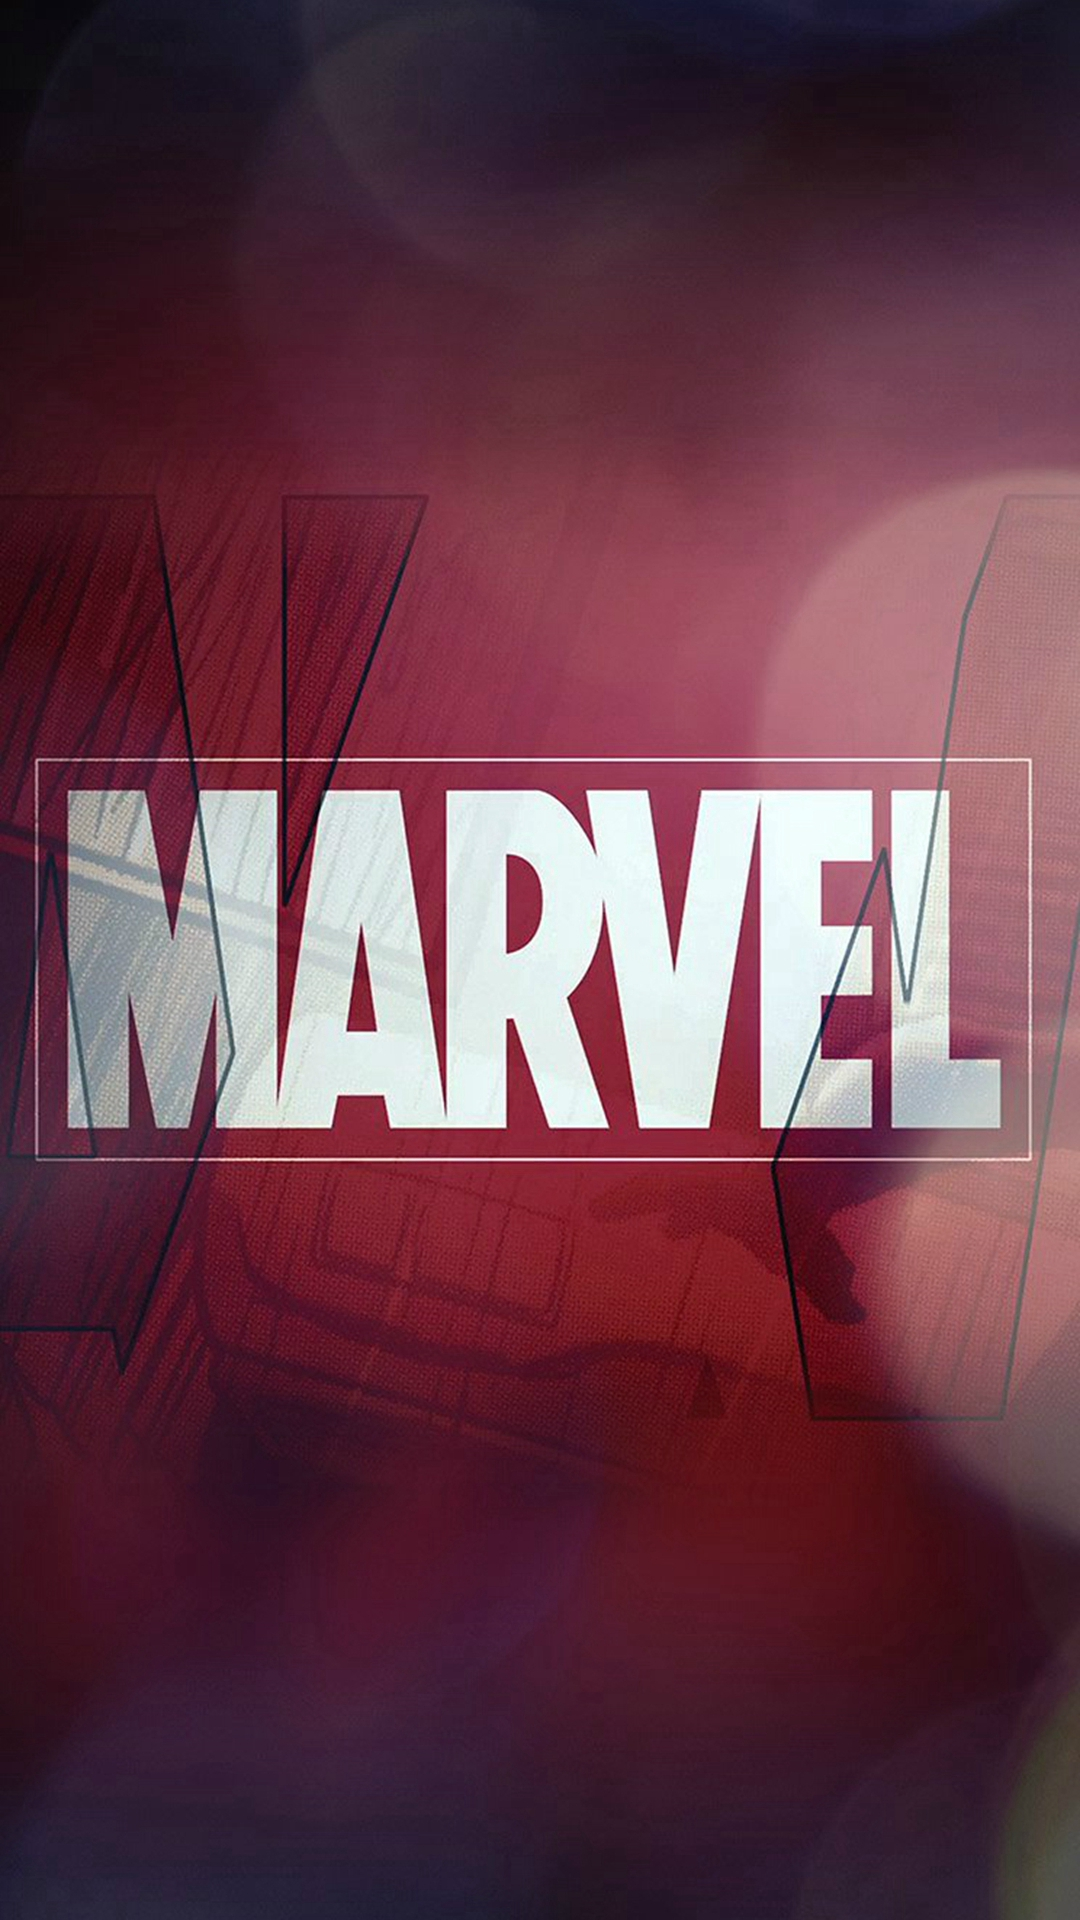 Marvel Logo Wallpaper Iphone - HD Wallpaper